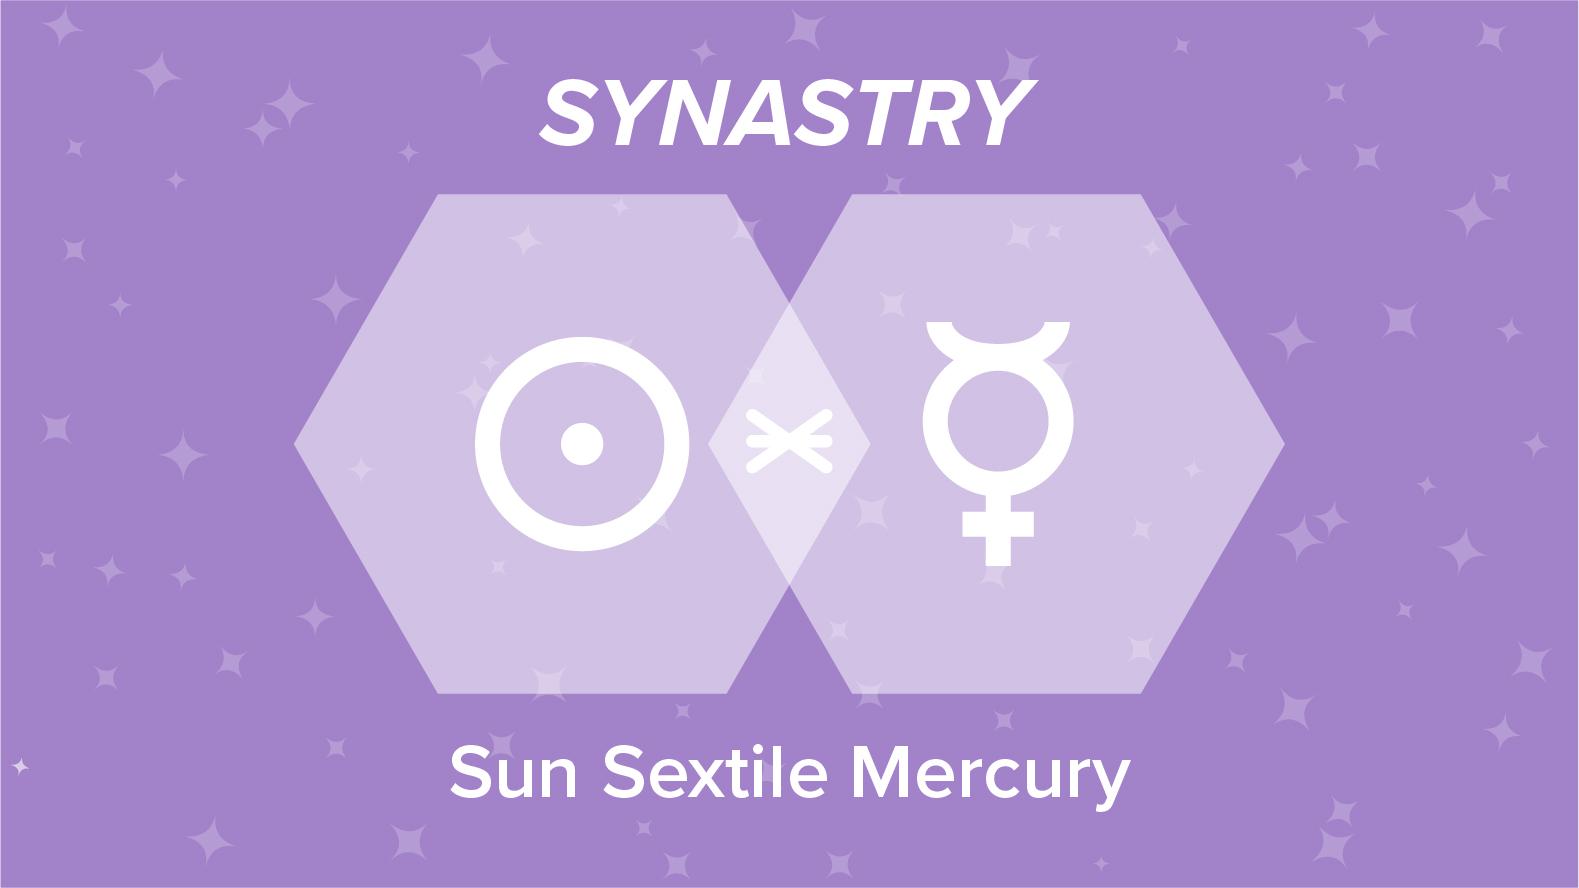 Sun Sextile Mercury Synastry